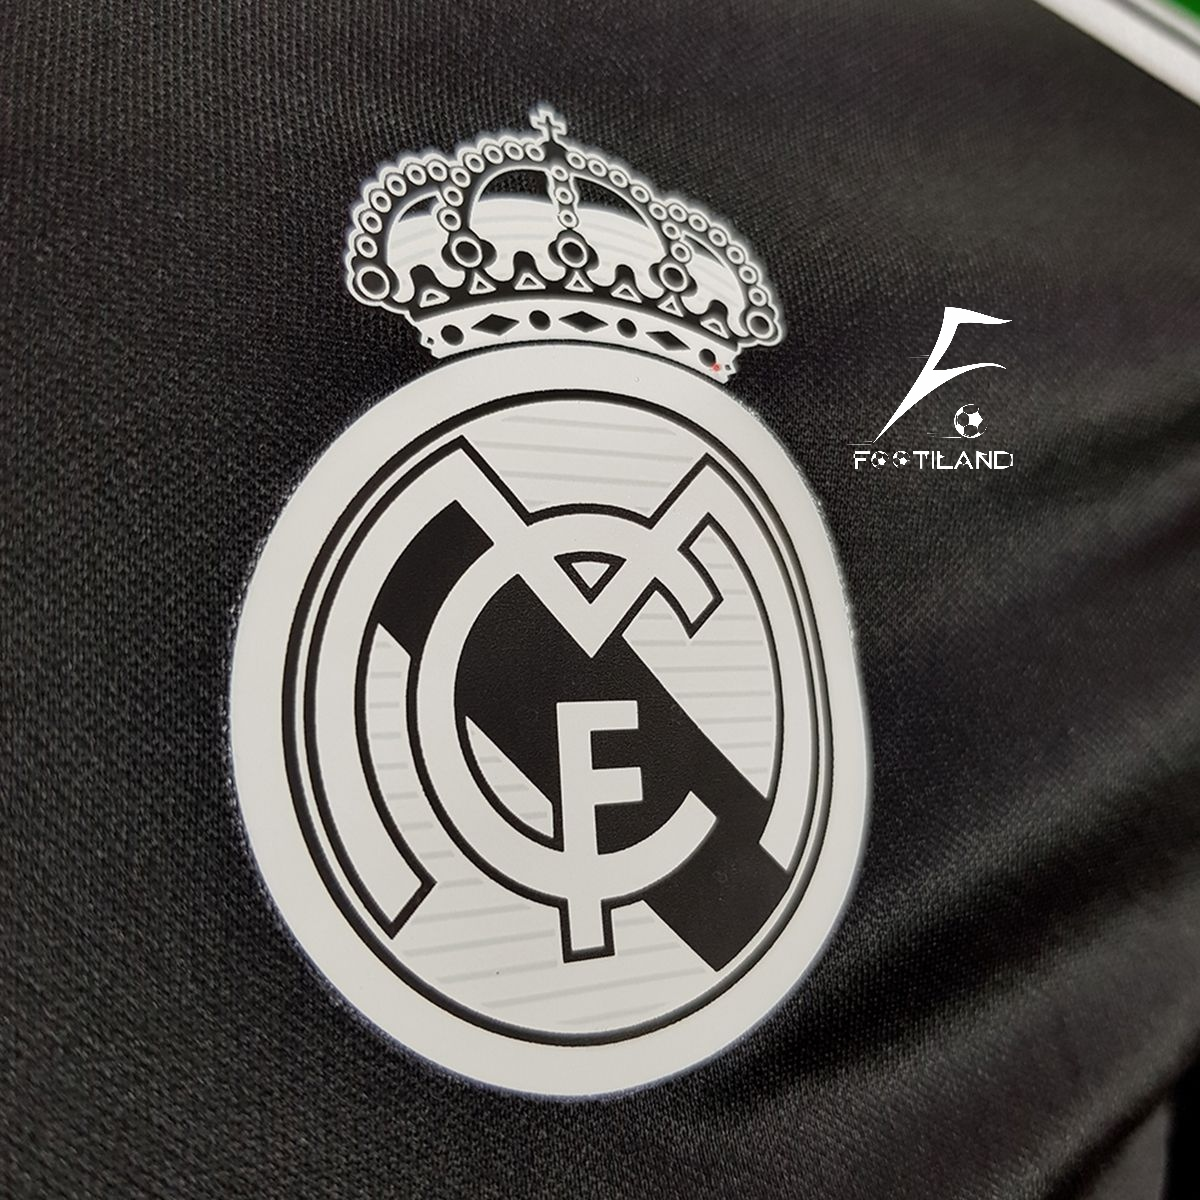 لباس کلاسیک سوم رئال مادرید آستین بلند 2014